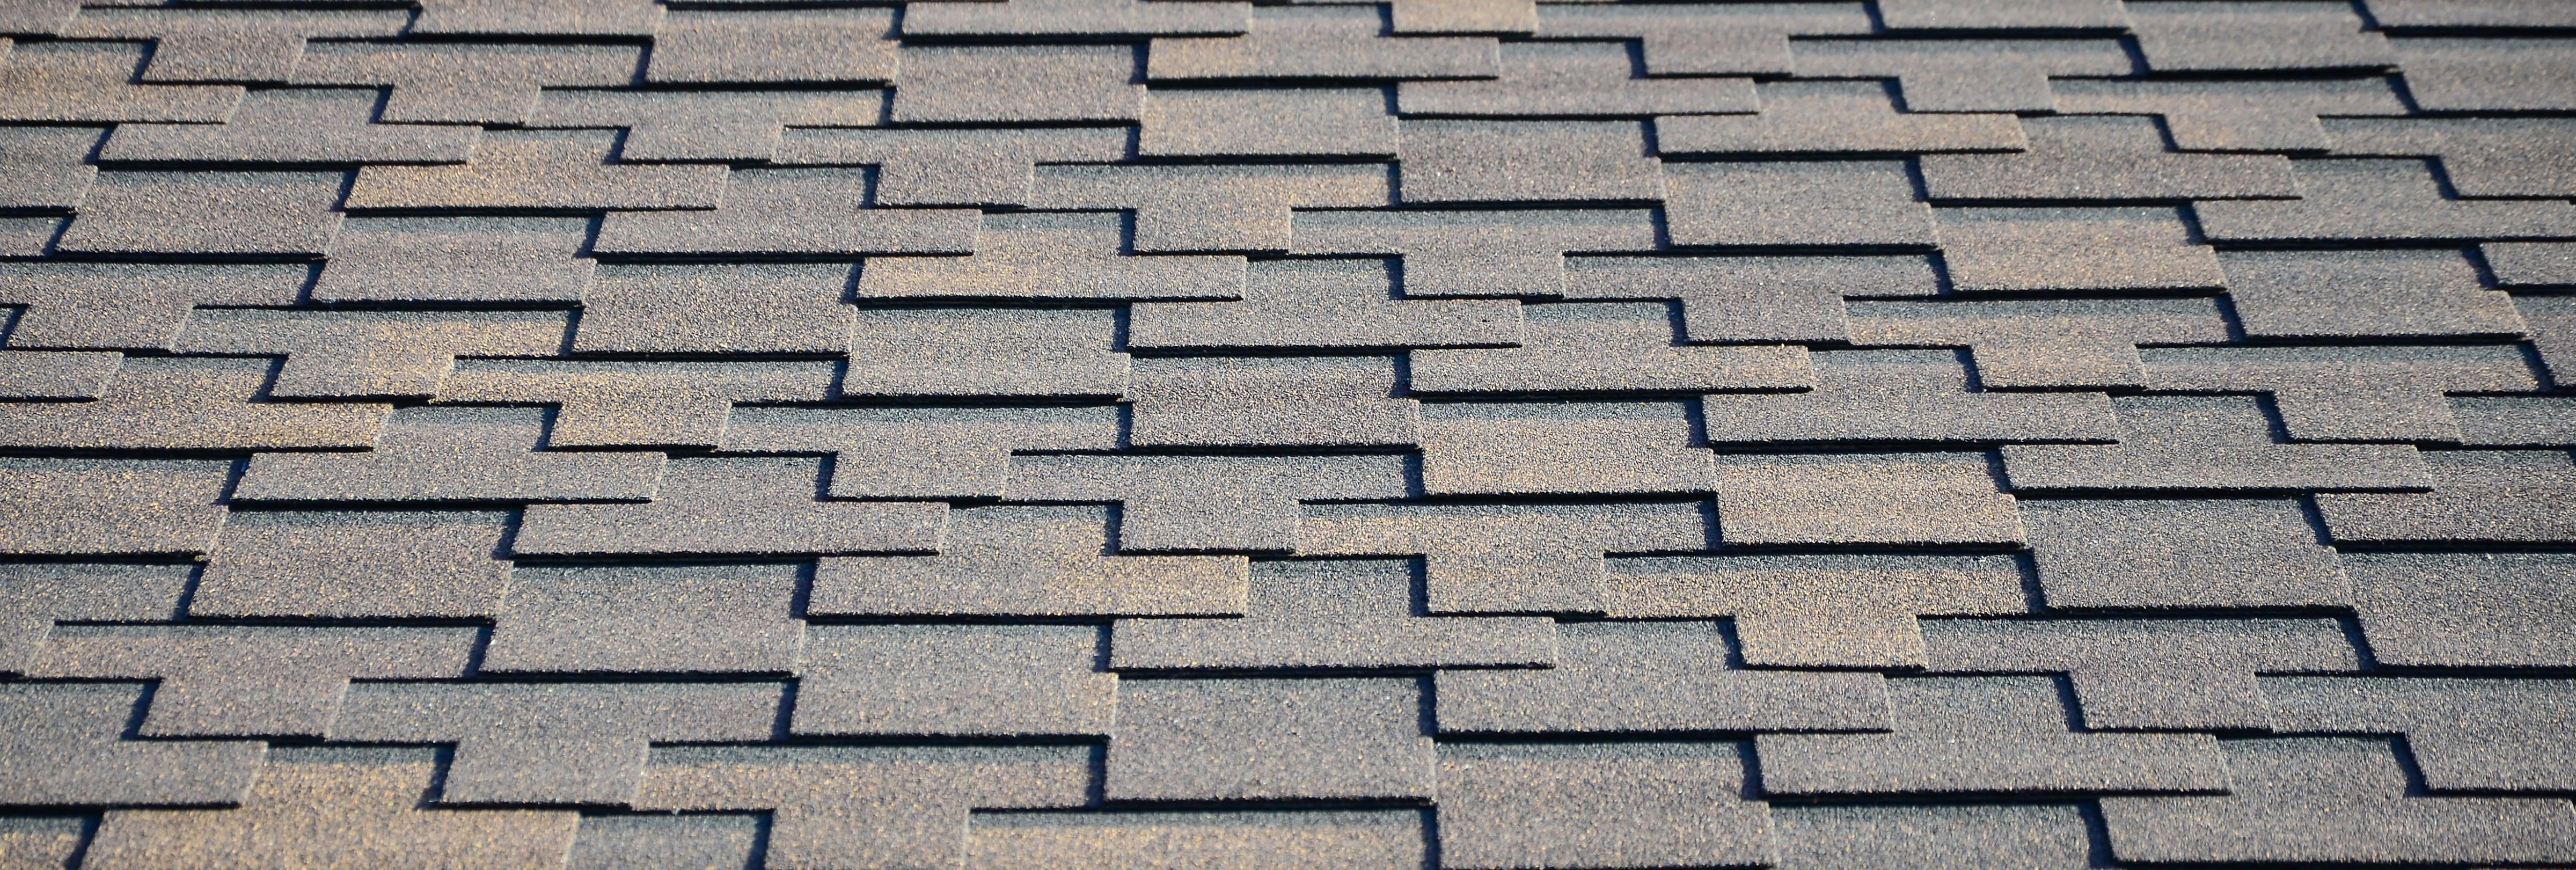 Roof, Roof Shingles